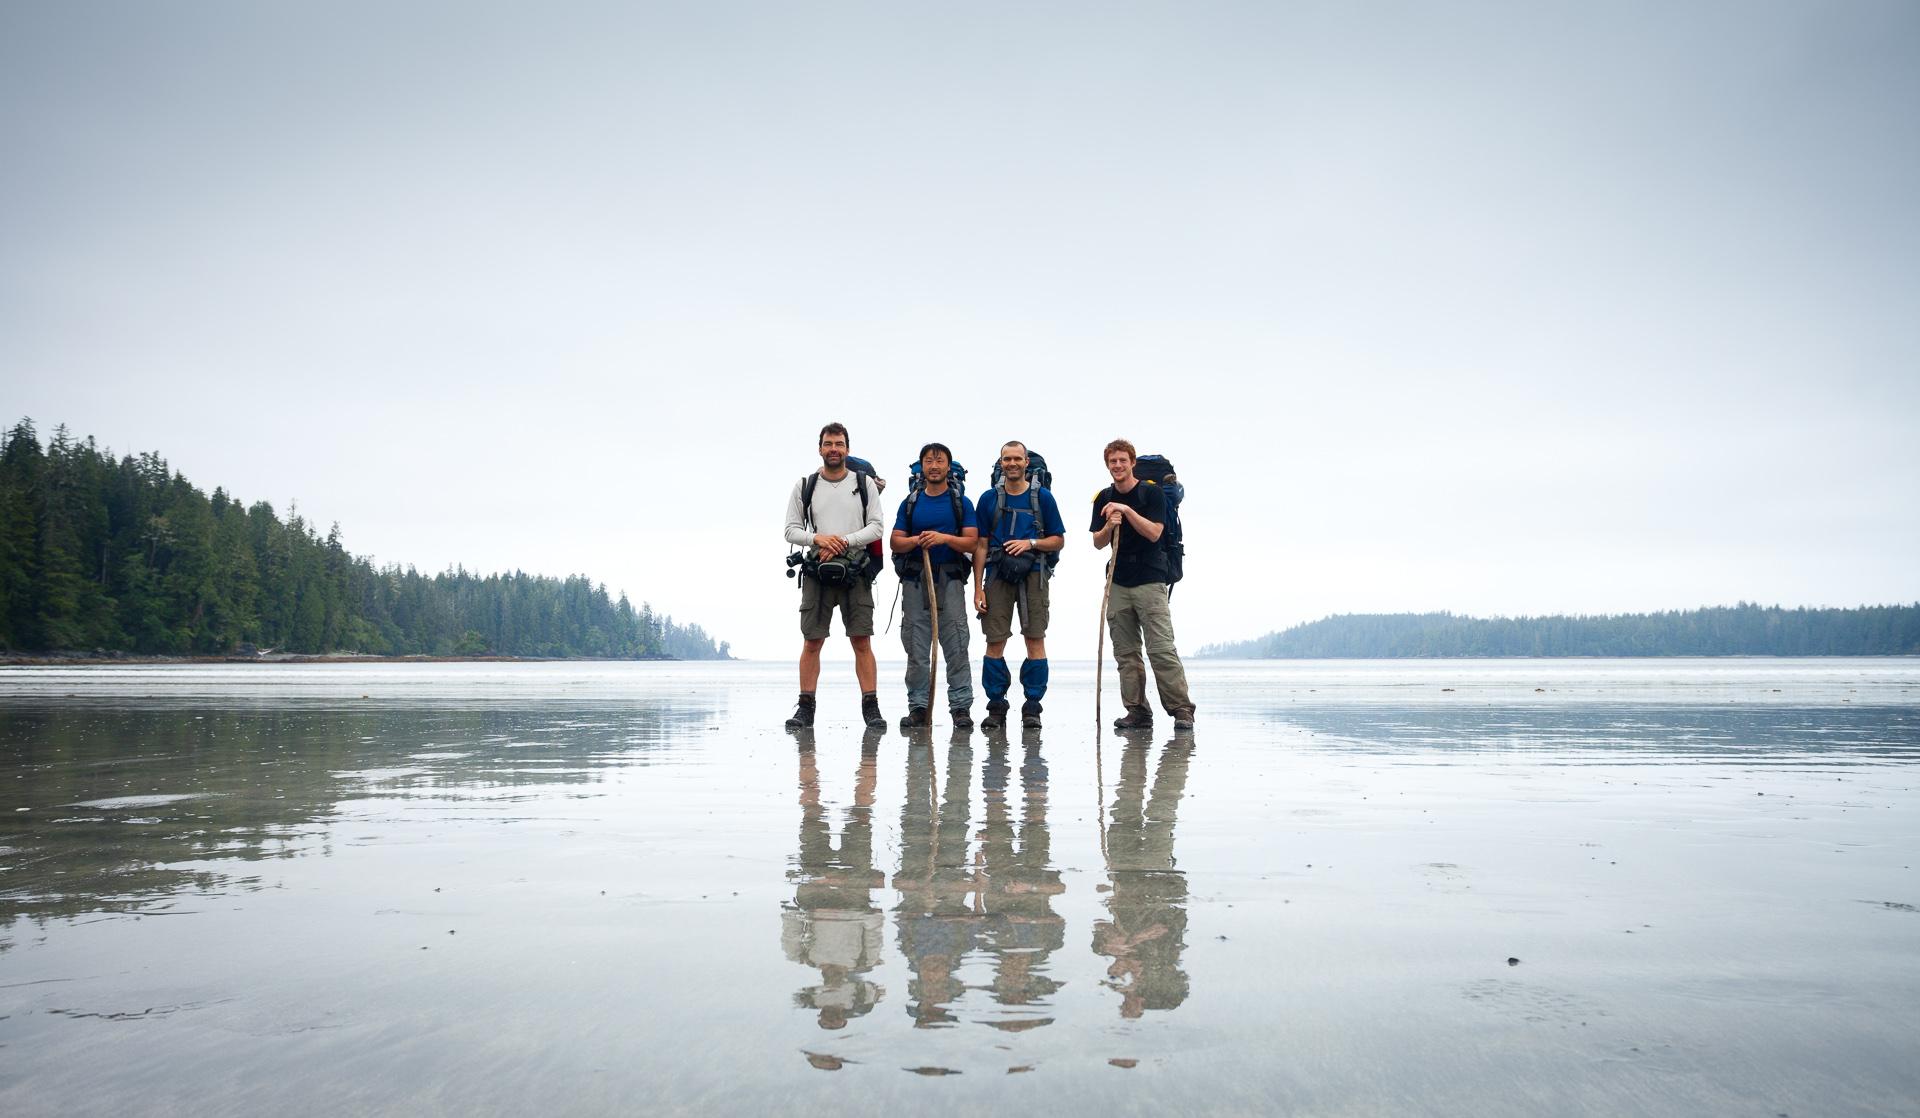 west-coast-trail-hikers-bamfield-tj-watt.jpg